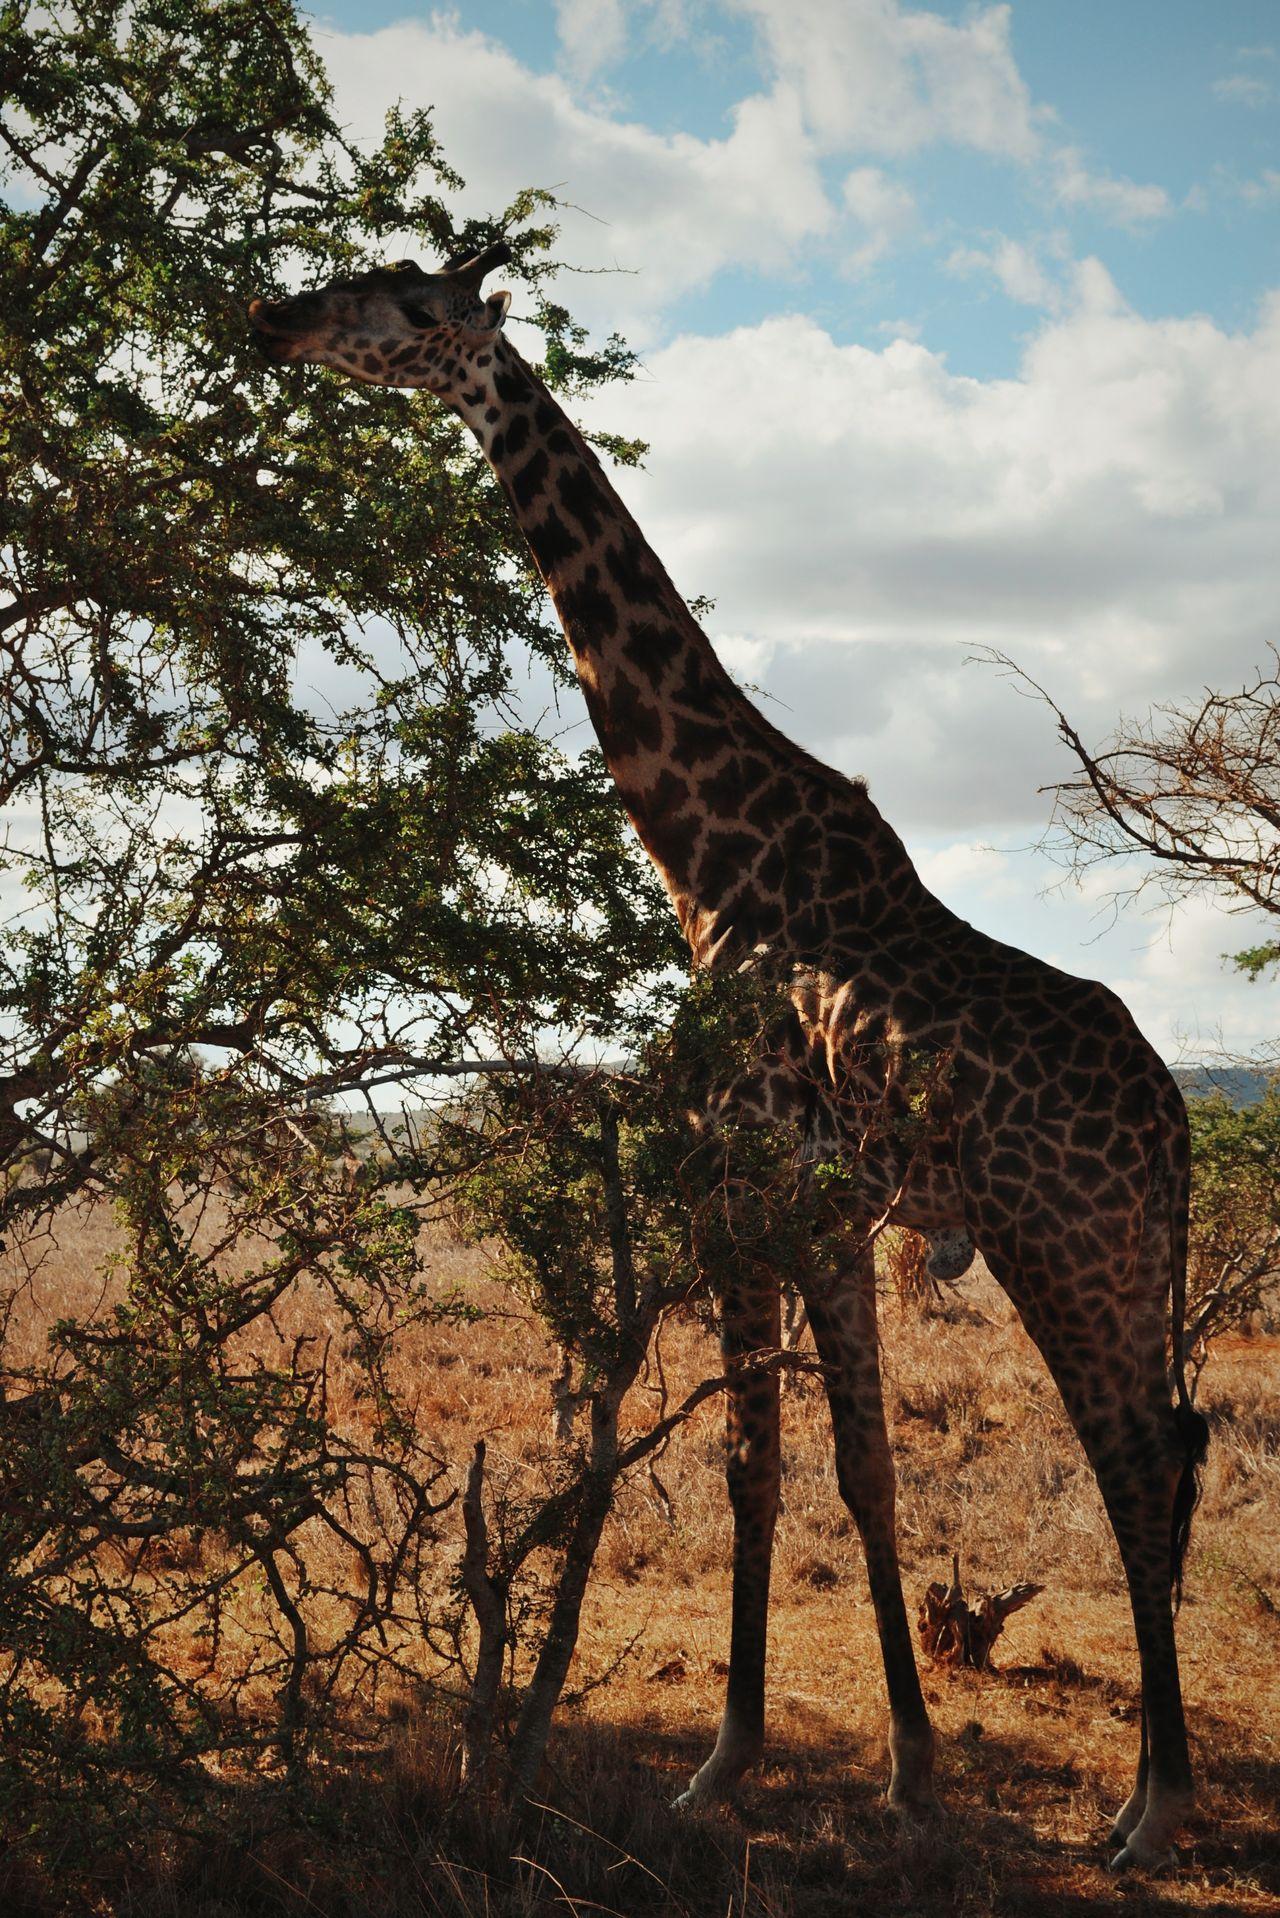 Tsavo east, Kenya. Tree Giraffe Acacia Nature Outdoors VSCO Kenya Tsavo Africa EyeEm Best Edits EyeEm Best Shots Adventure Travel Destinations Travel Safari Go To Kenya Beauty In NatureAnimals In The Wild Animal Themes Landscape Nature Animal Wildlife Animal